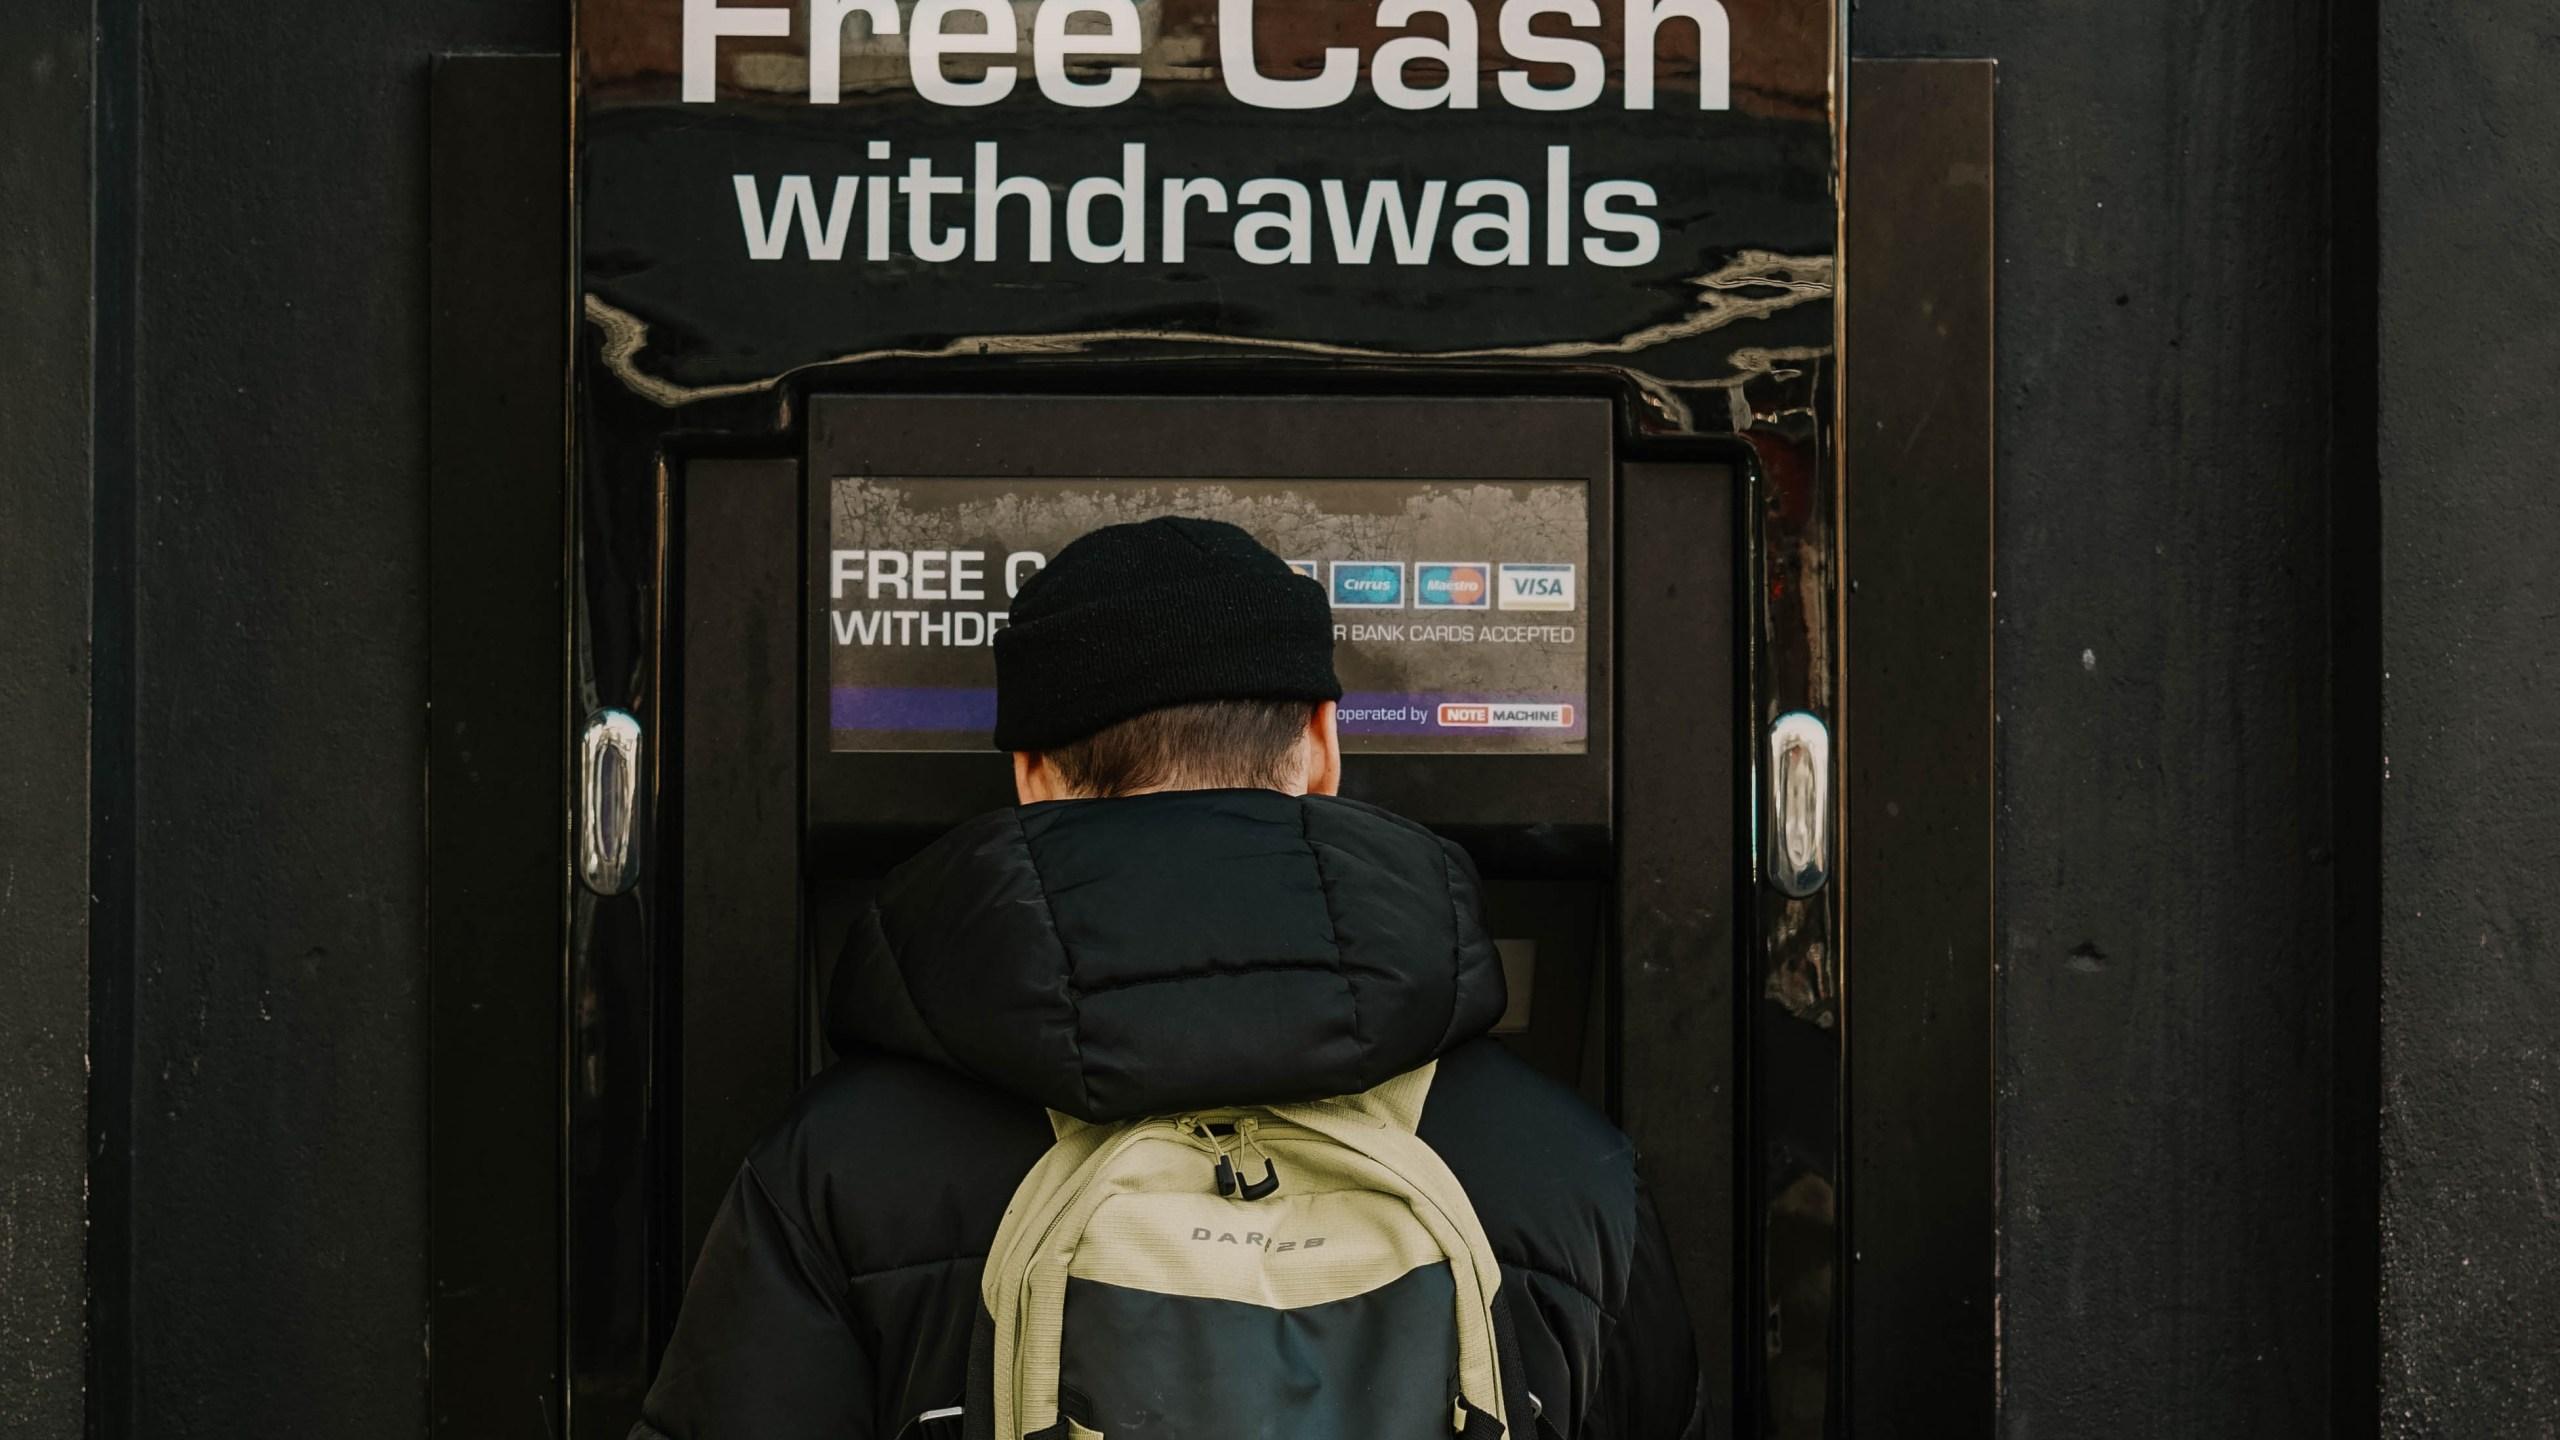 ATM generic (Toa Heftiba / Unsplash)